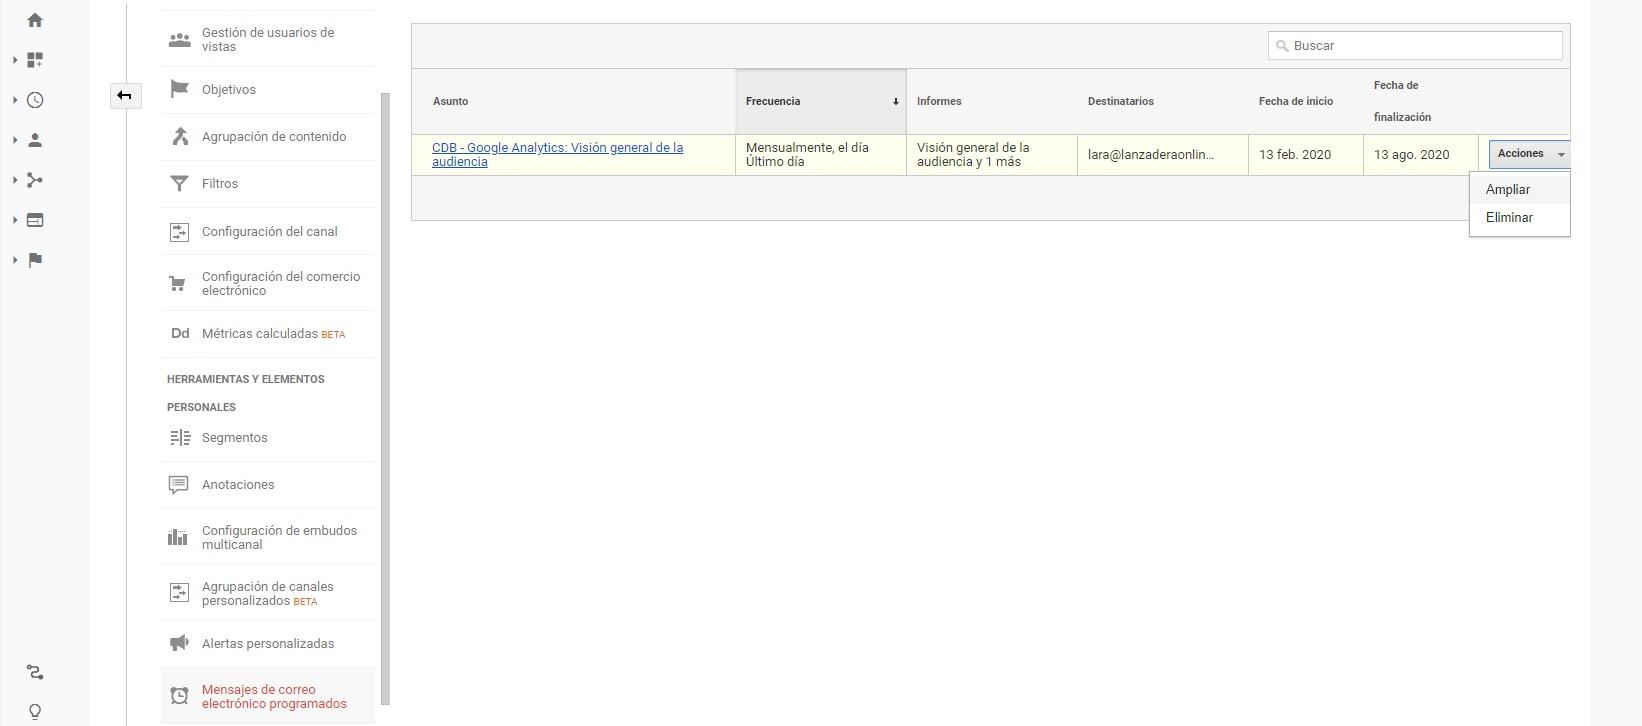 recibir editar cambiar informes de google analyctis por email de forma automatica 10